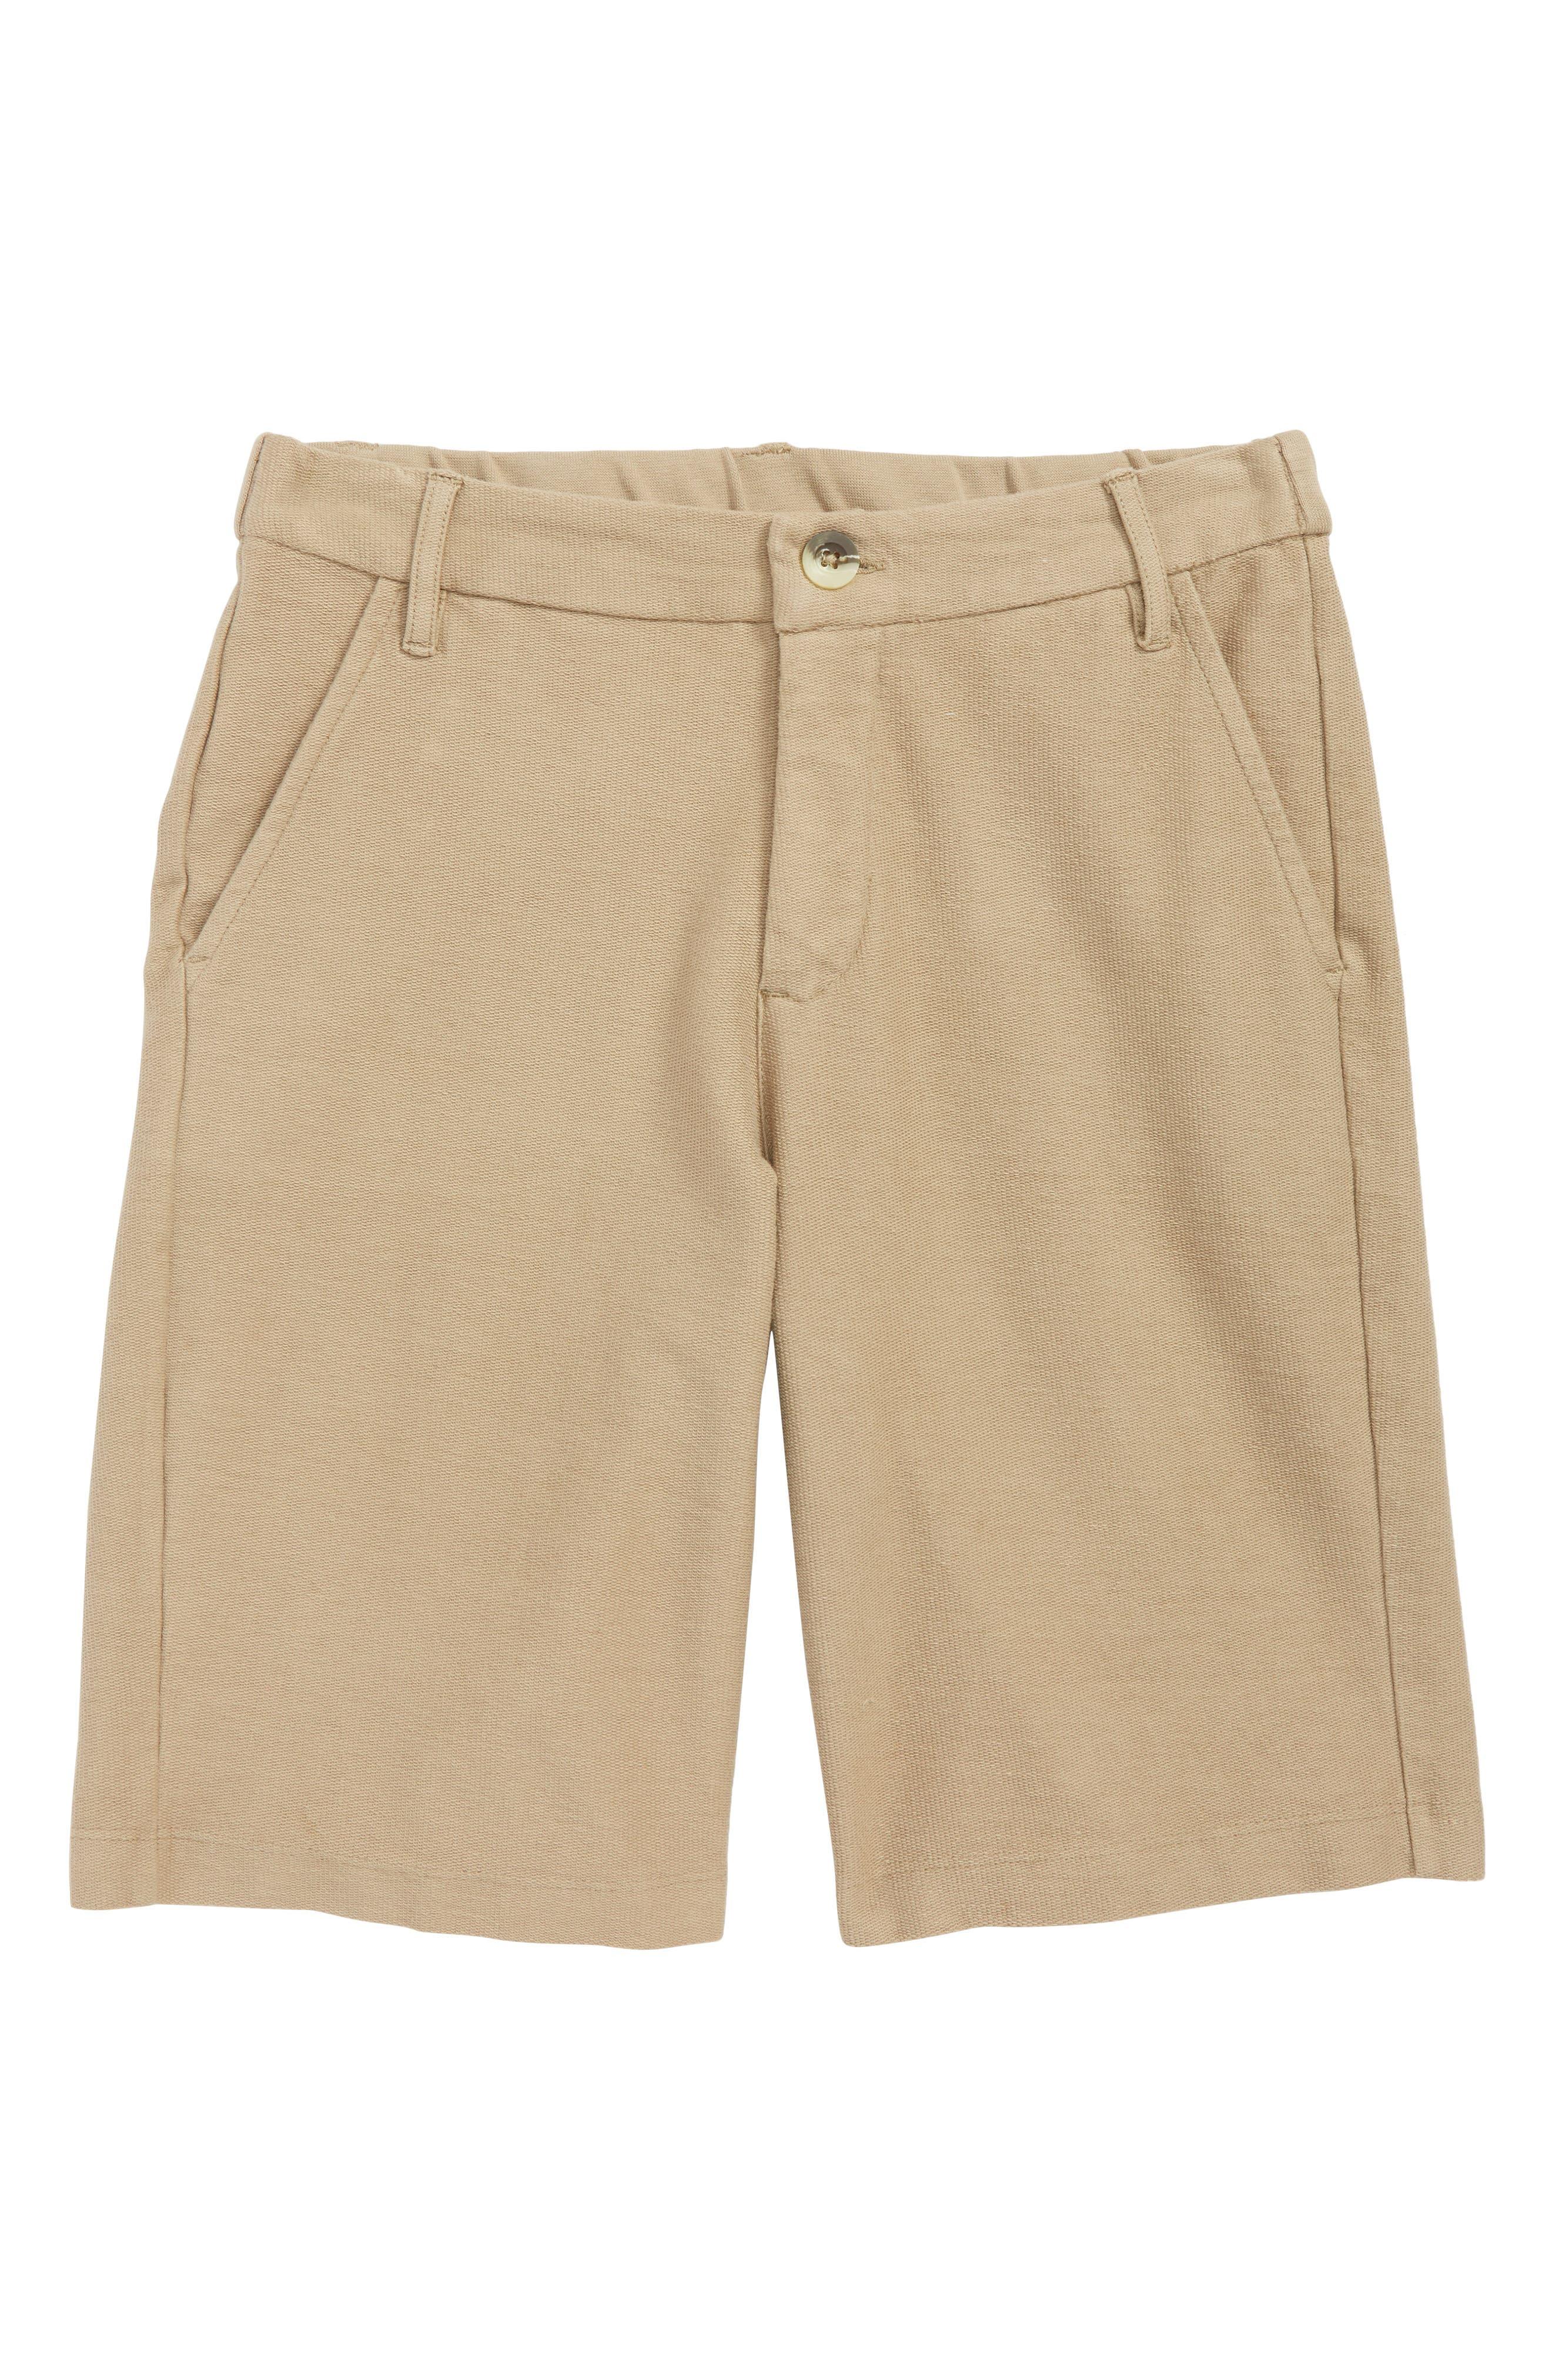 Easton Shorts,                         Main,                         color, 250